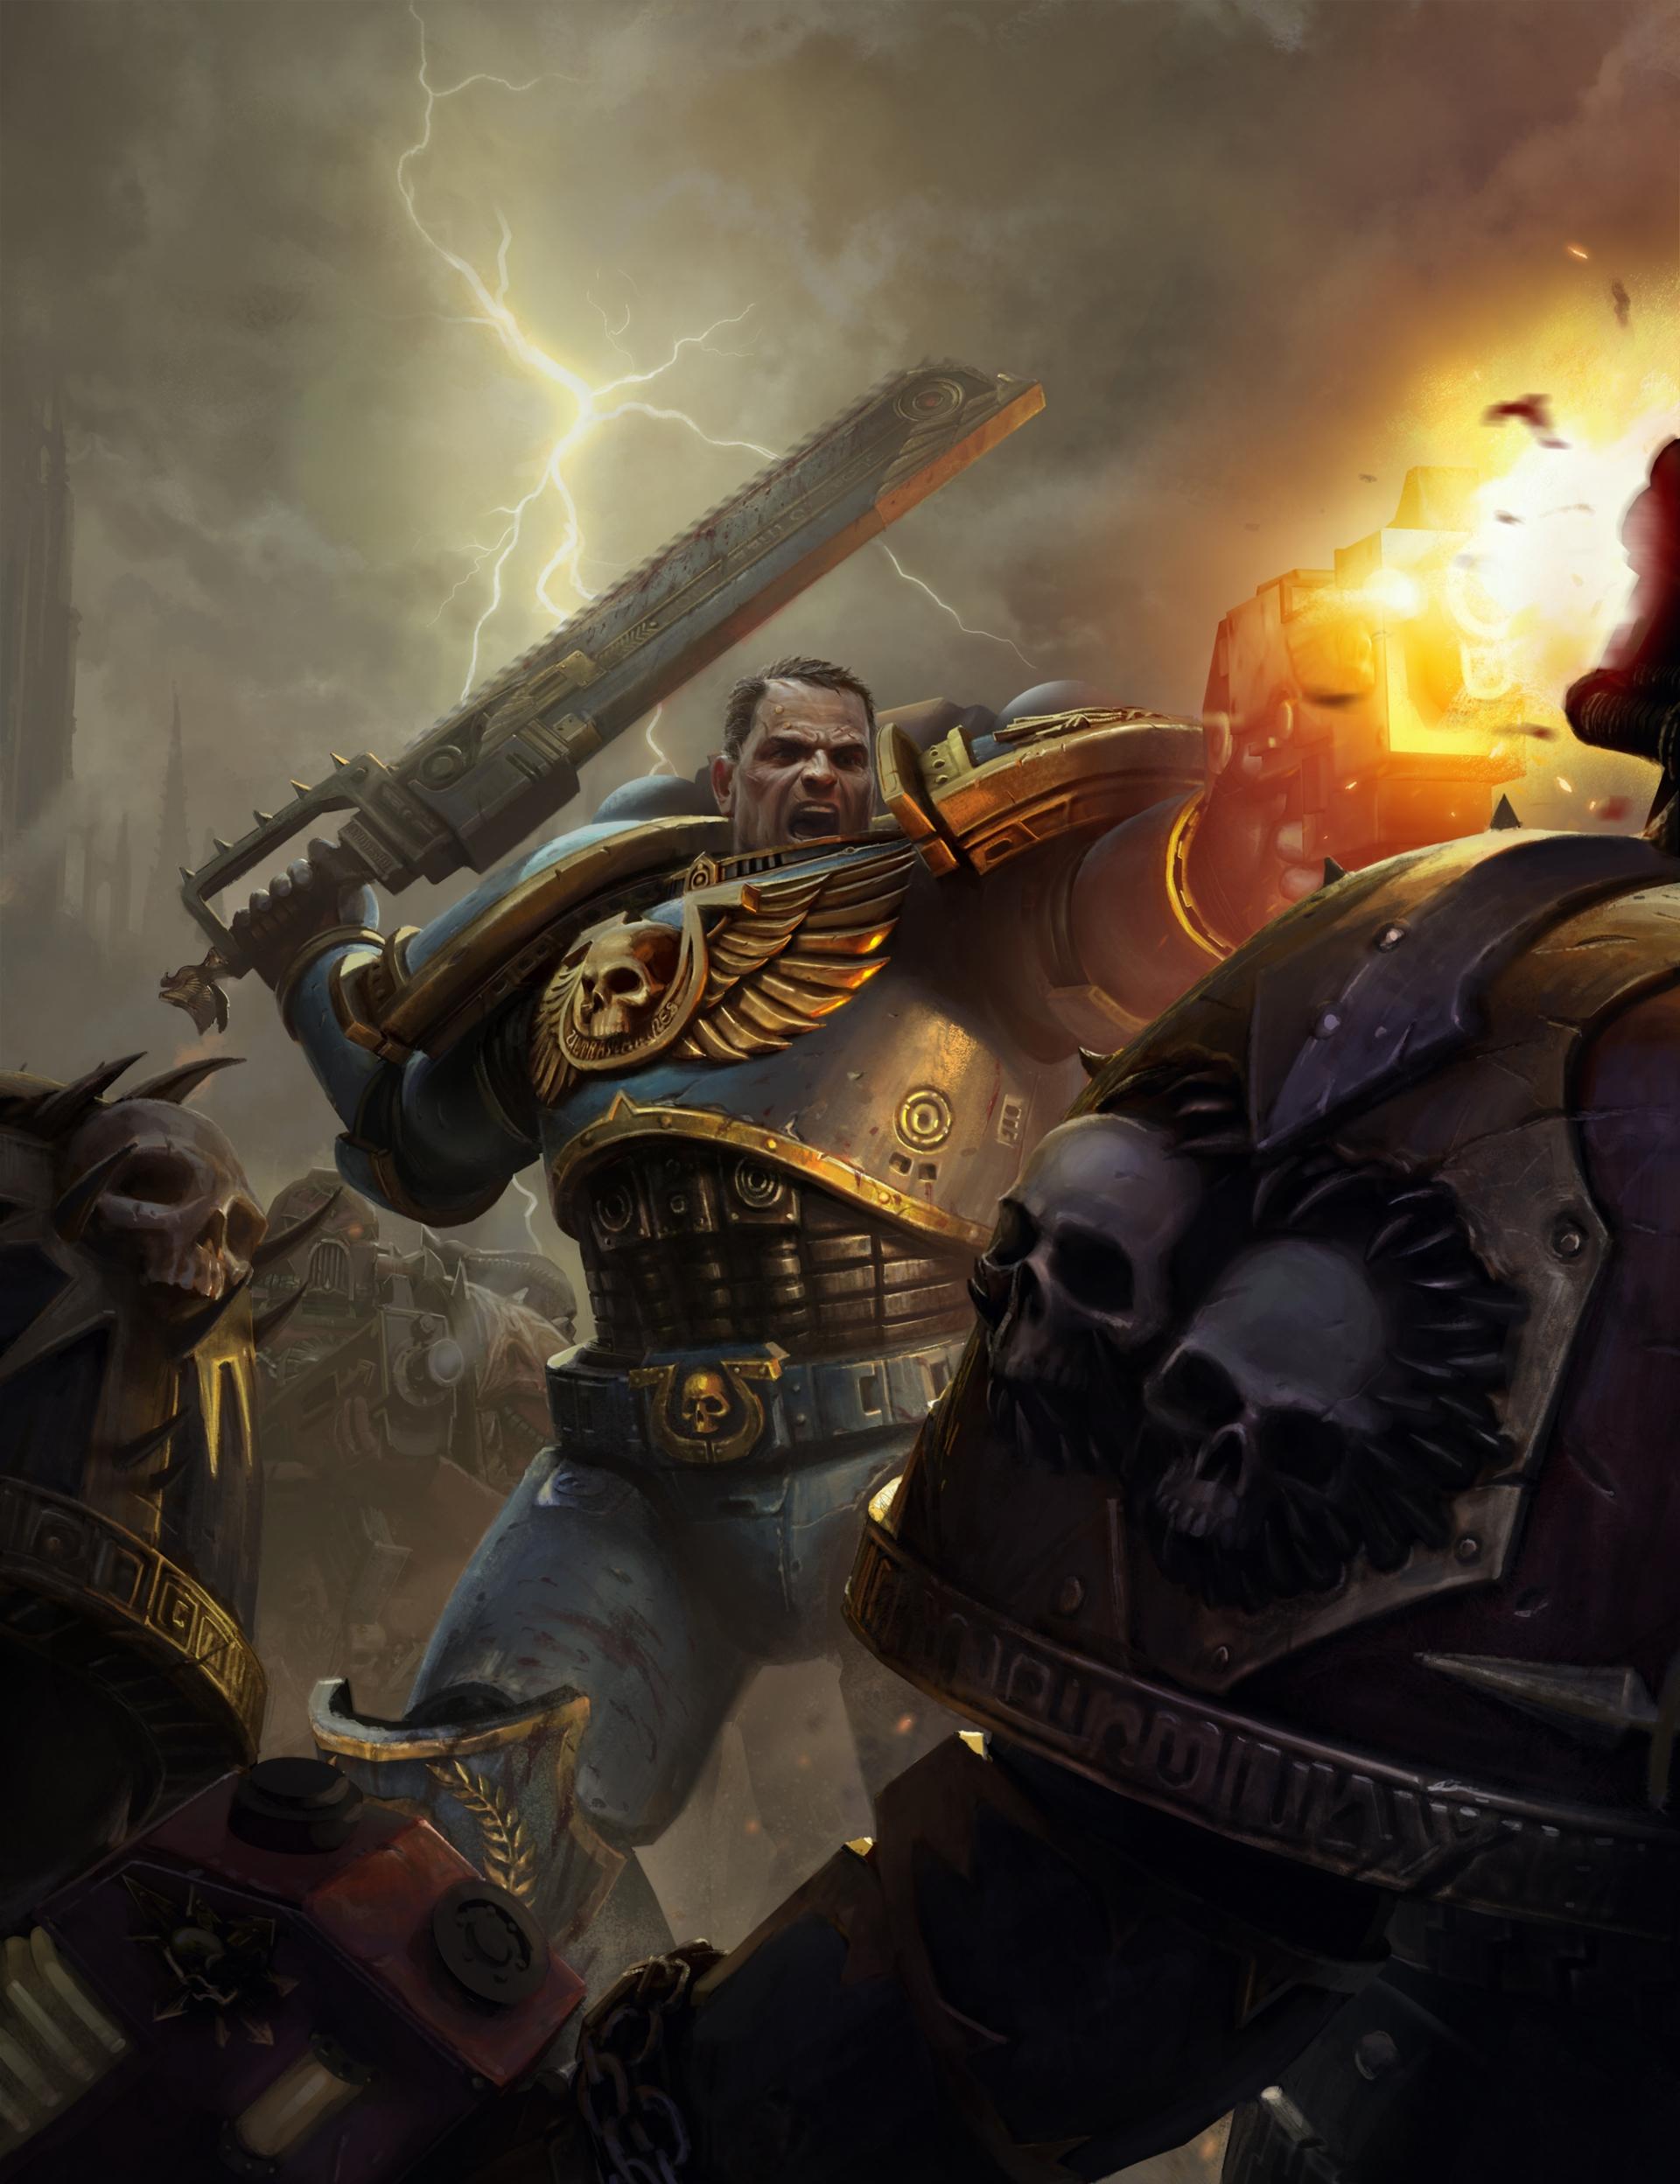 Арт к игре Warhammer 40,000: Space Marine